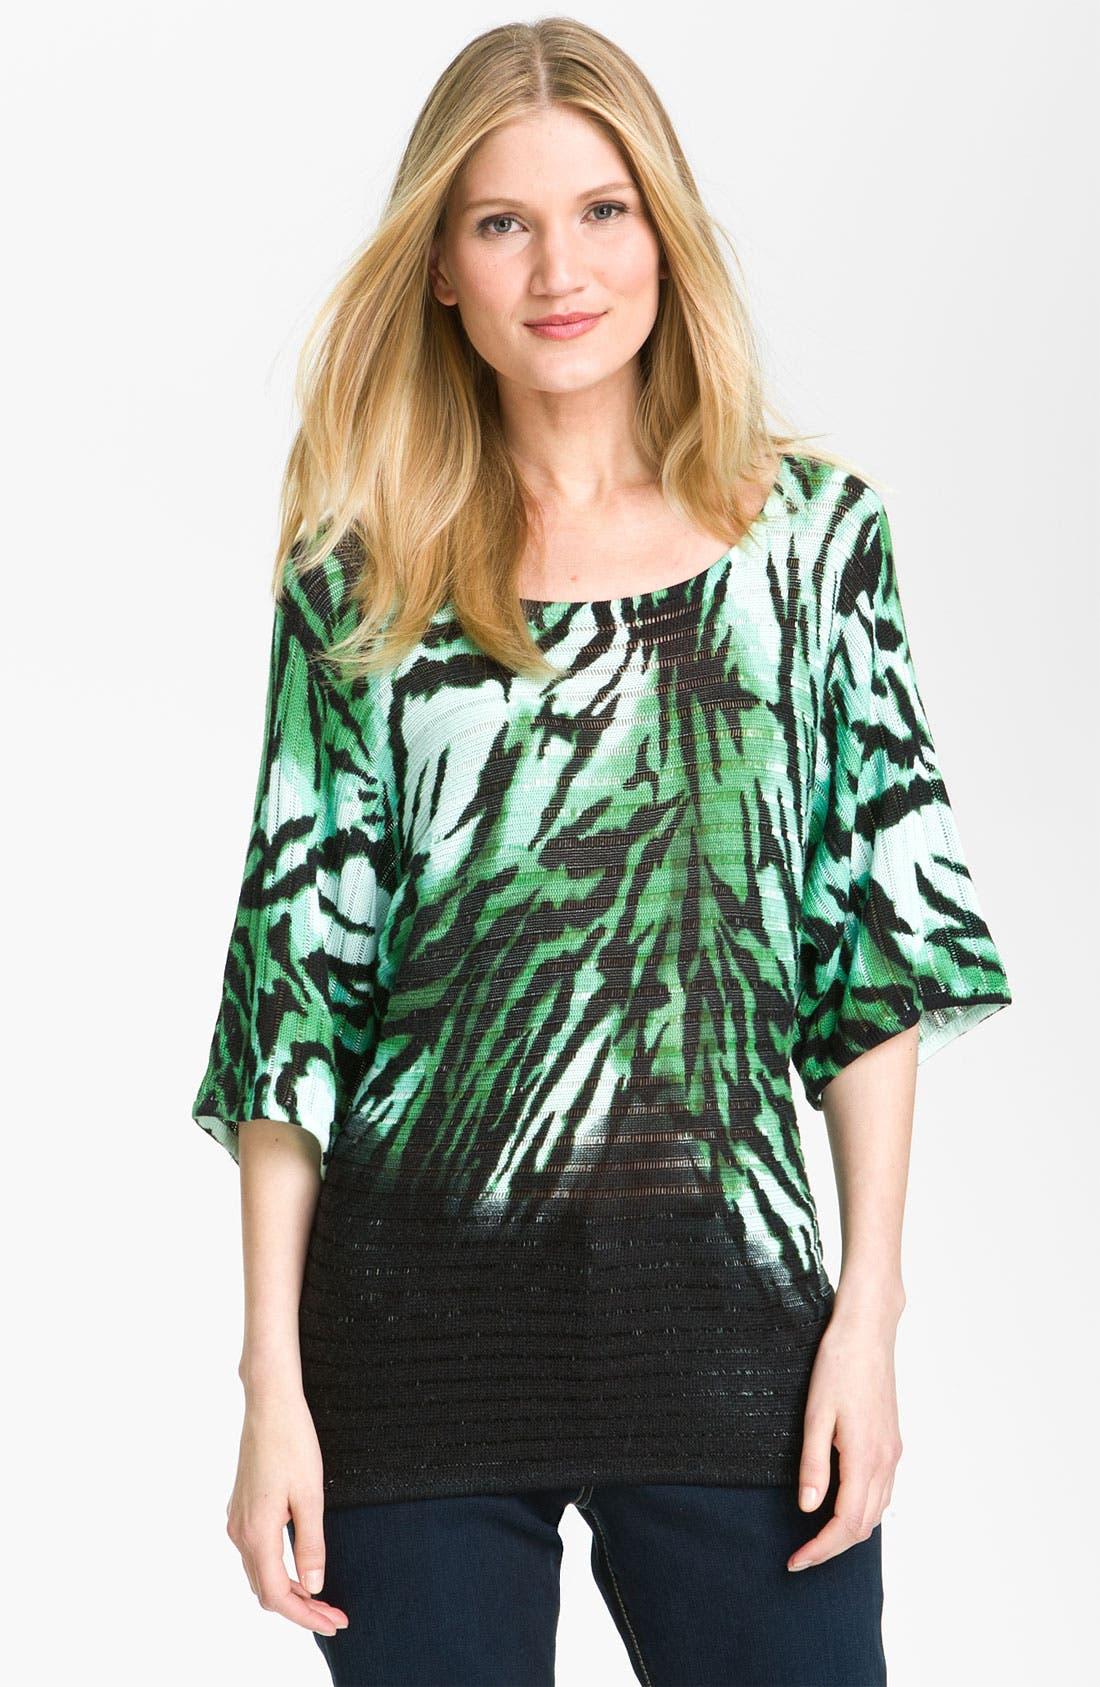 Alternate Image 1 Selected - Alberto Makali 'Zebra' Print Sweater